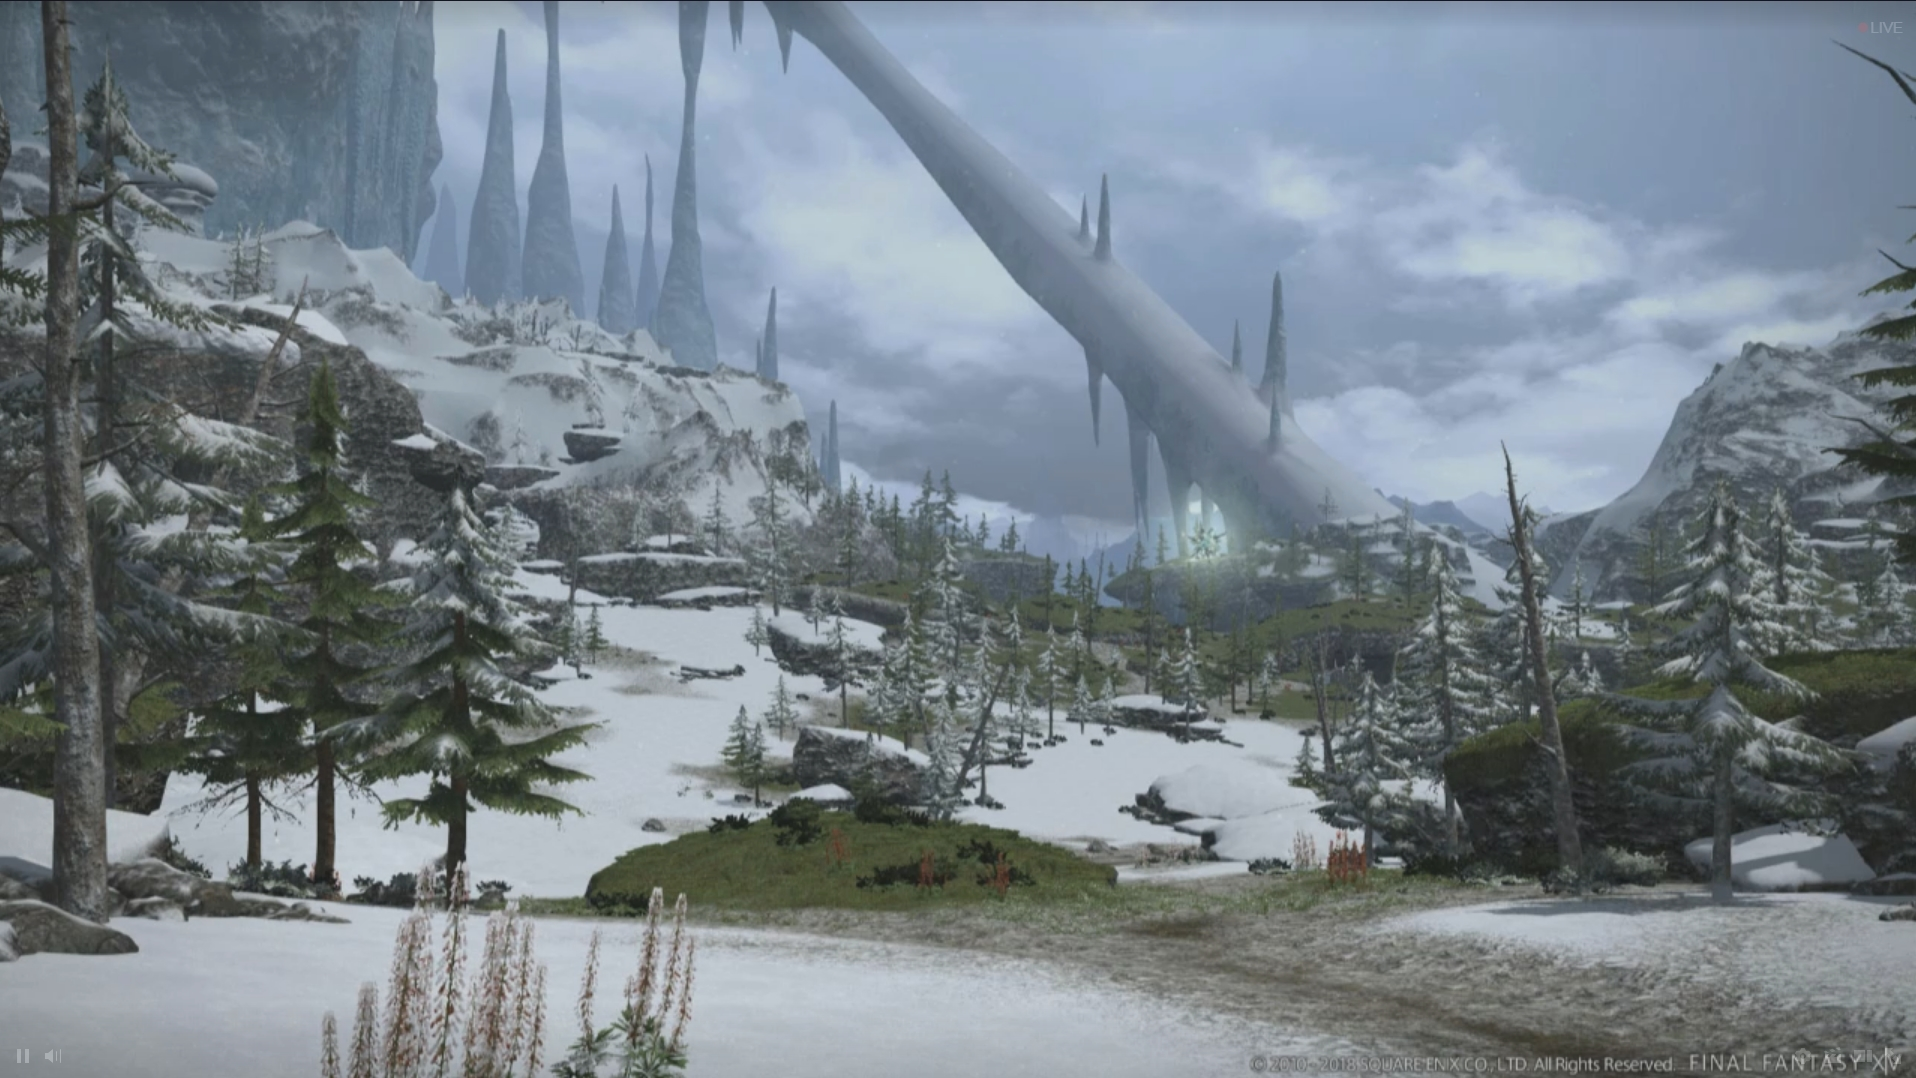 final fantasy xiv patch 4.3 eureka gebiet